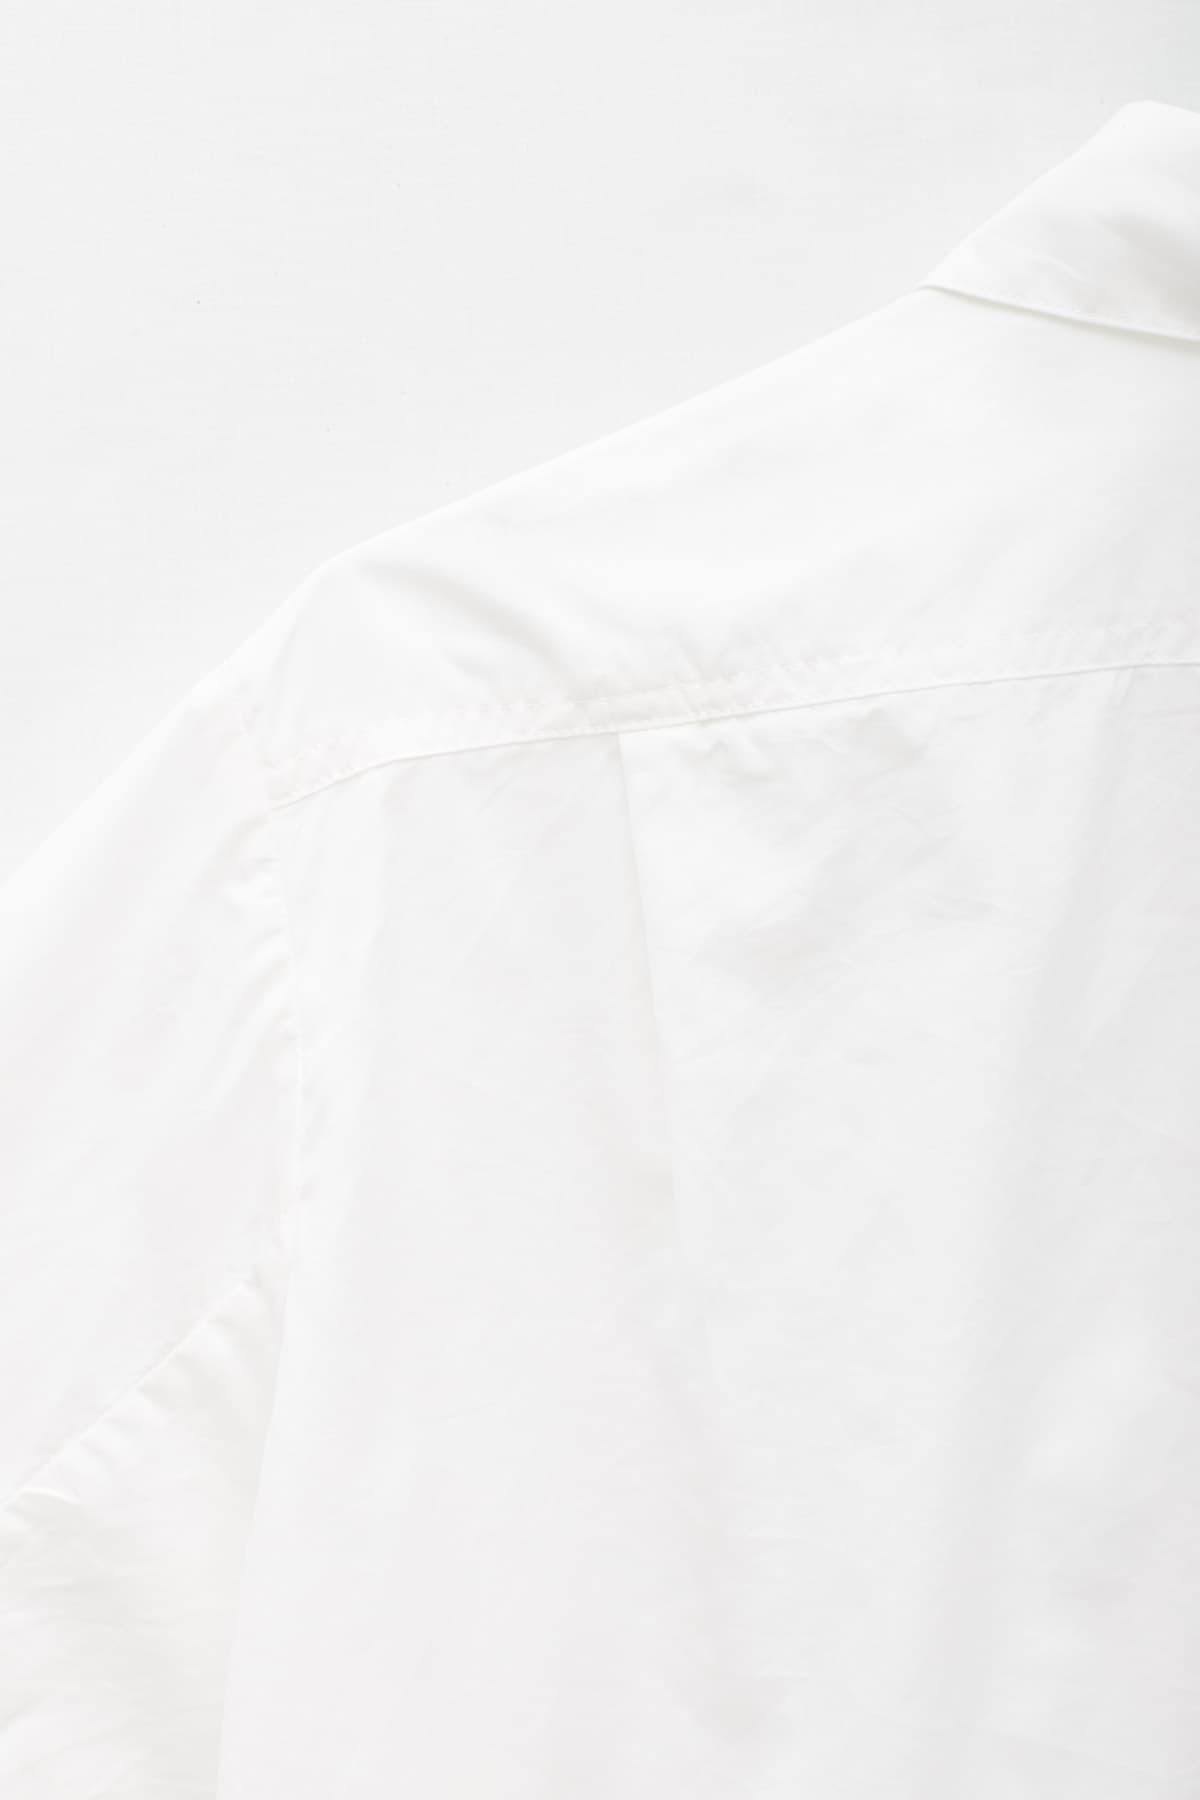 Shop Our Legacy Black Box 6TEEN6TYSIX T-Shirt